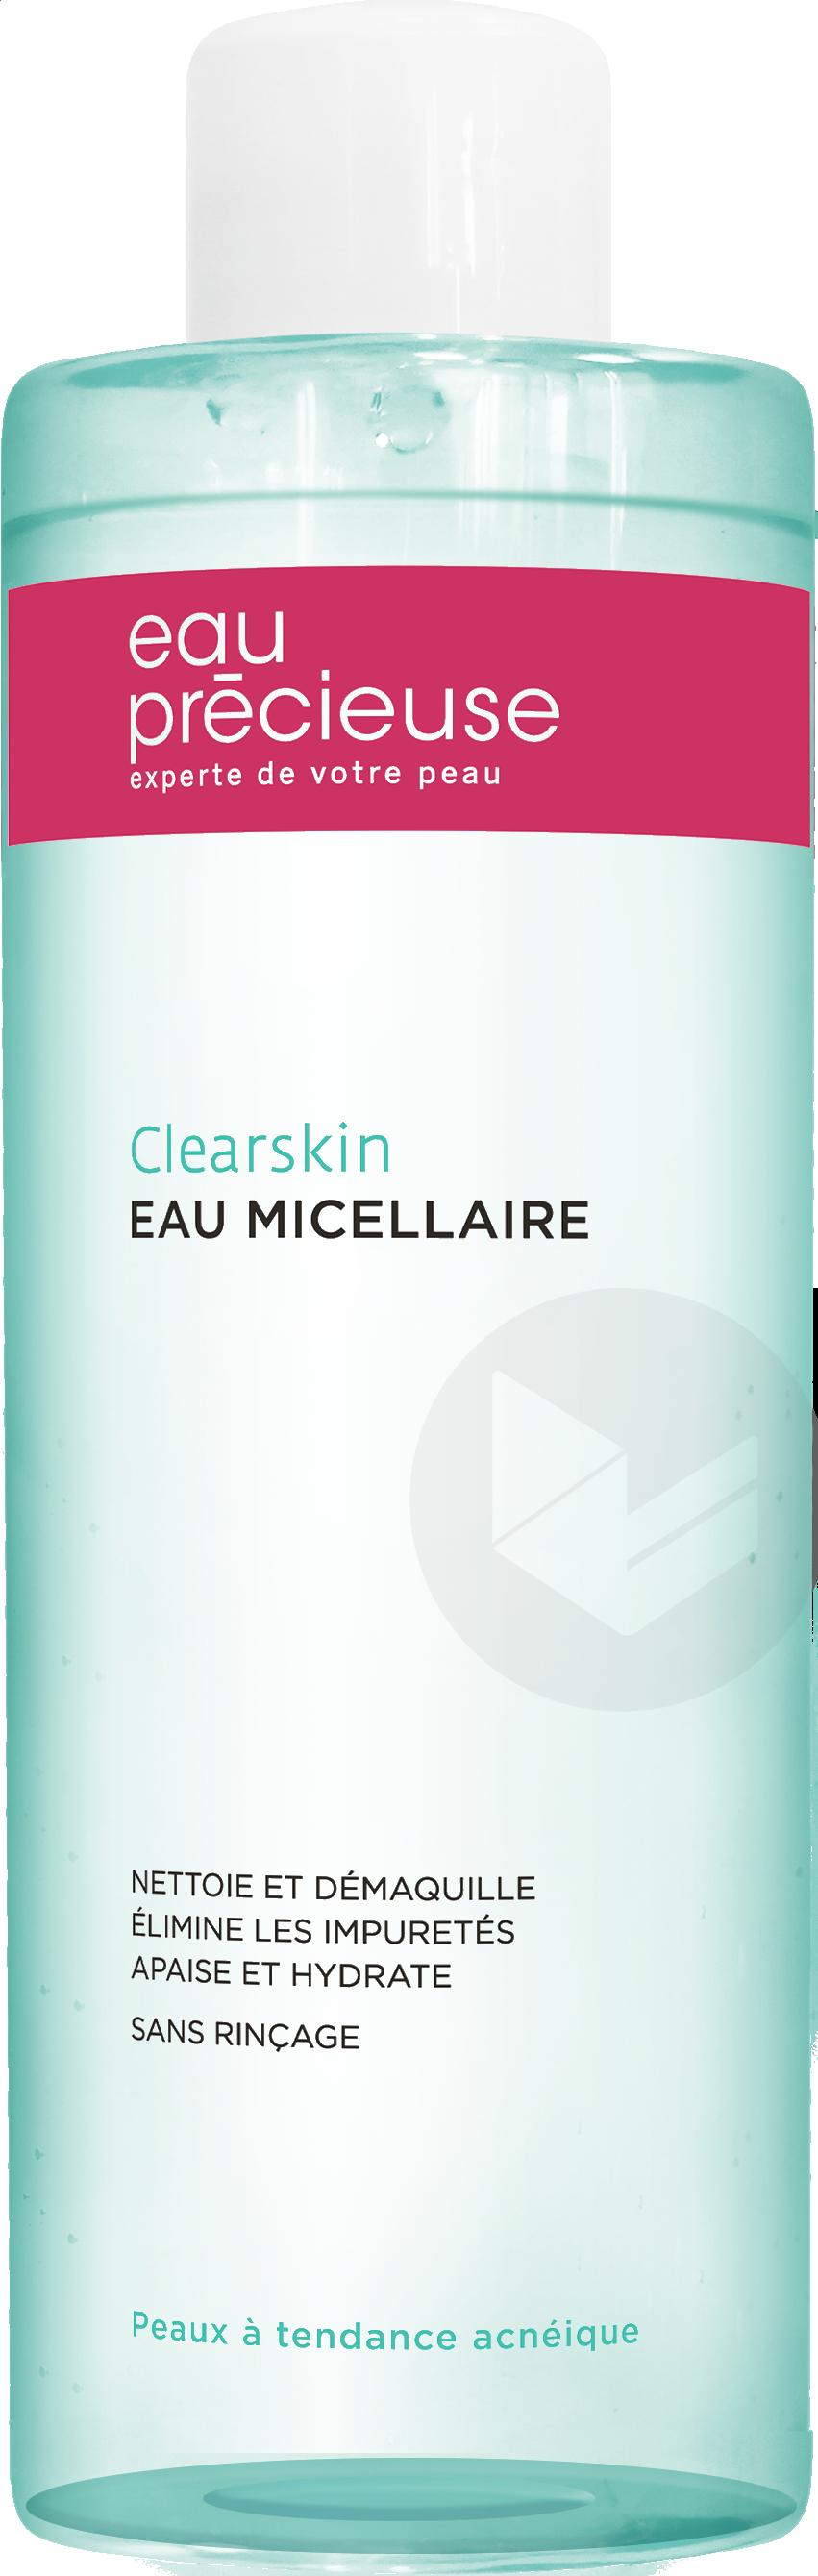 Clearskin Eau Micellaire 400 Ml